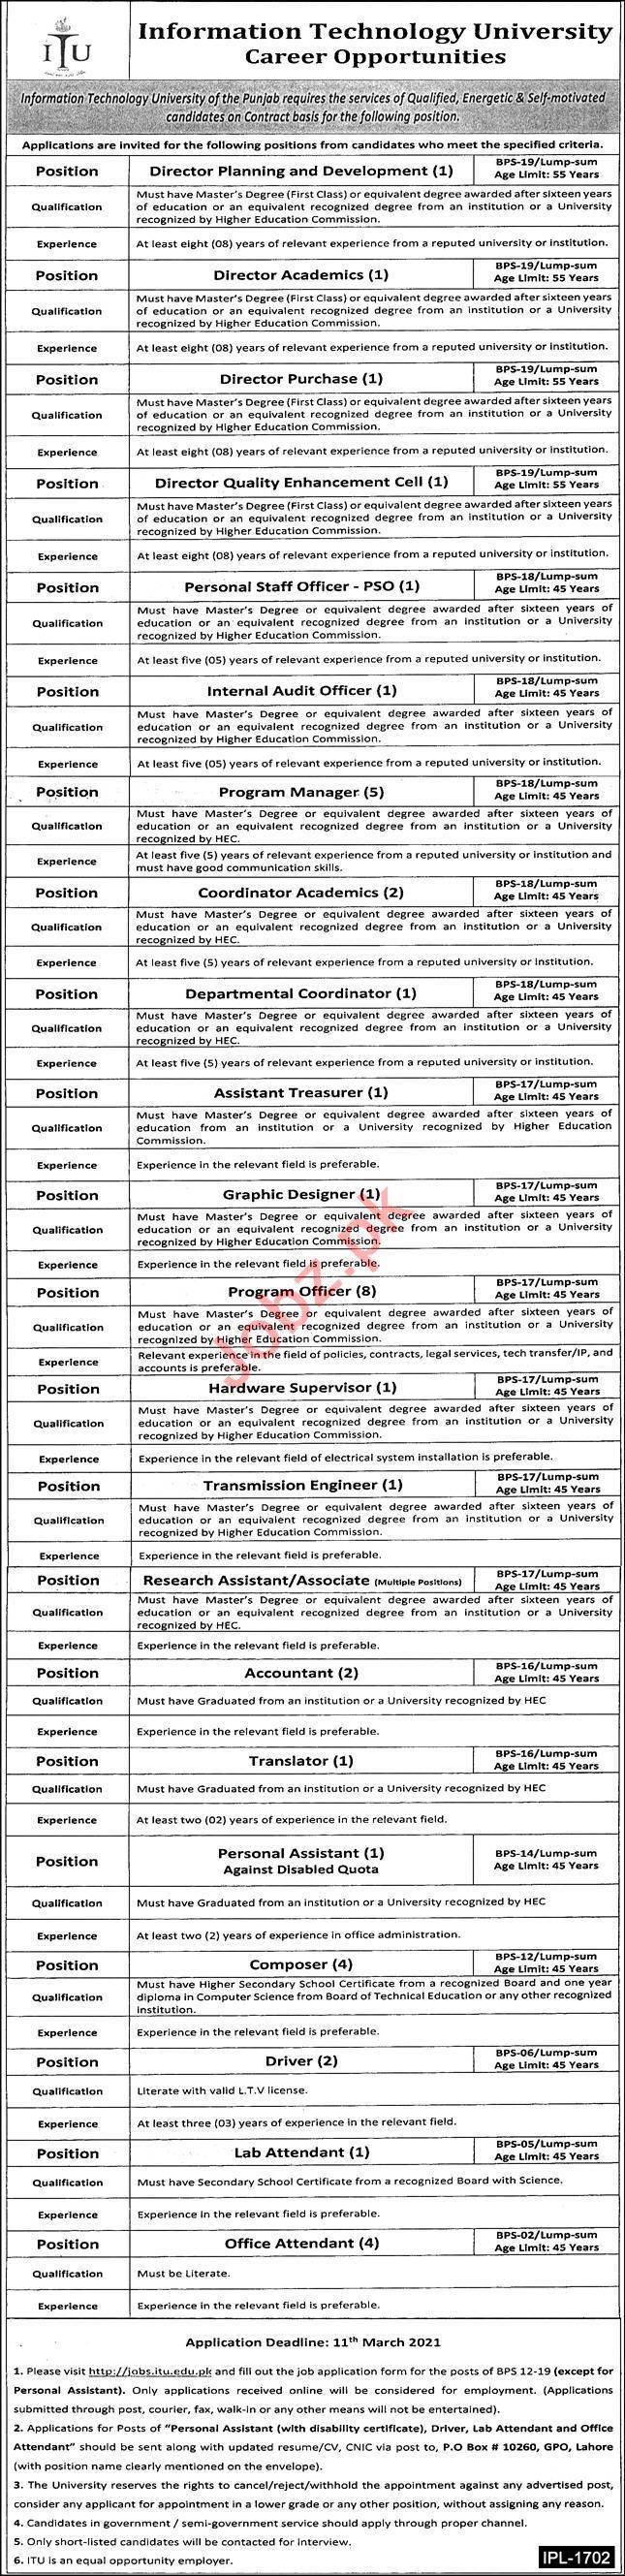 information Technology University ITU Jobs for Directors